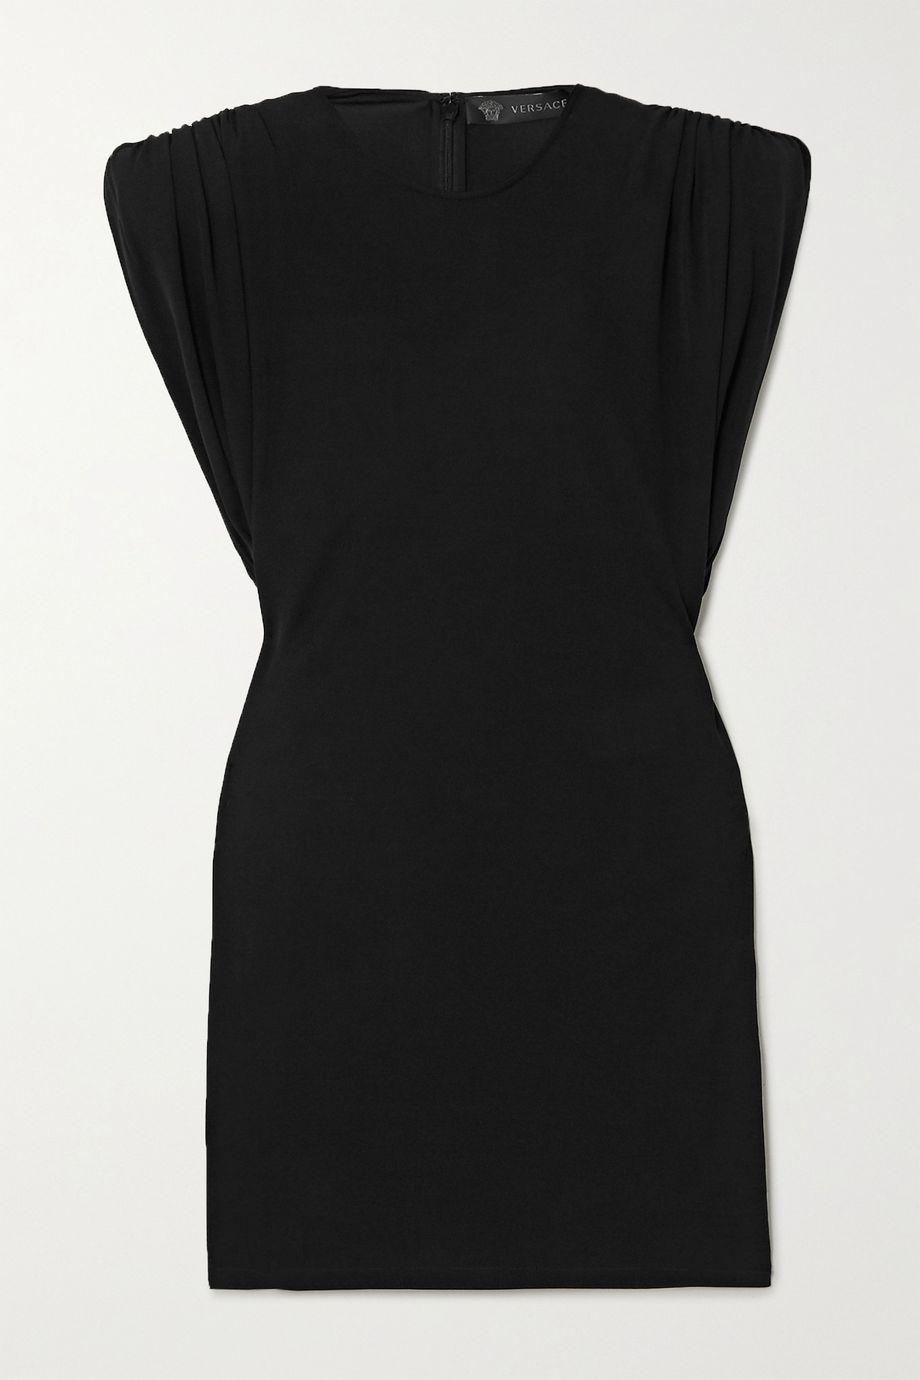 Versace Stretch-jersey mini dress